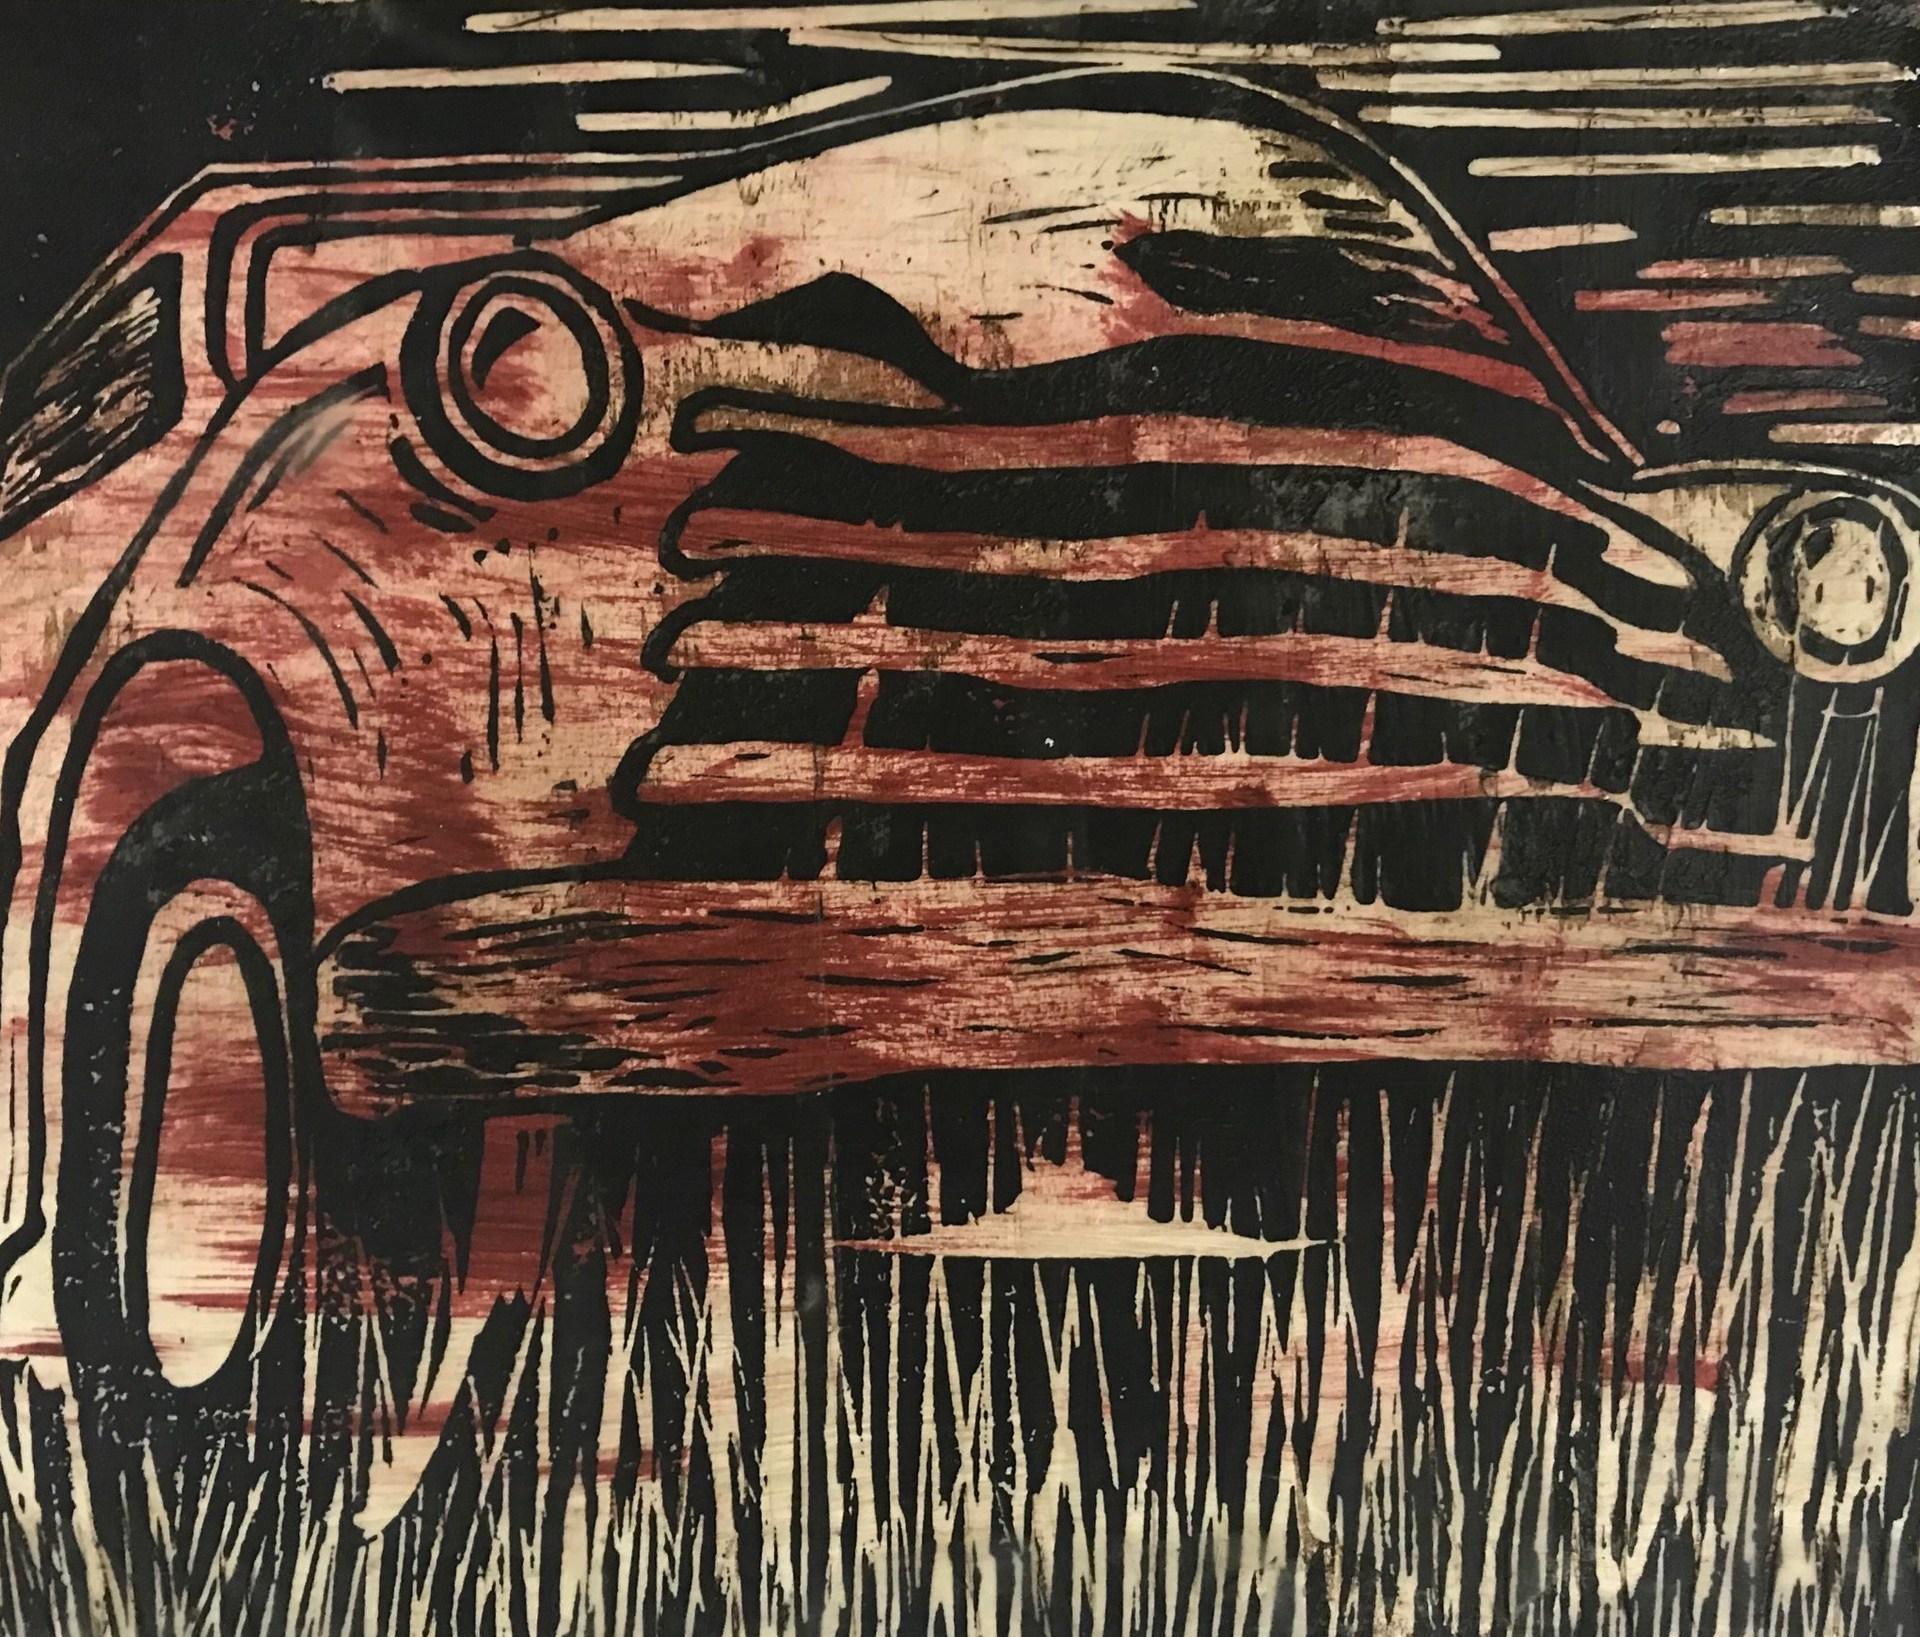 Print of a car